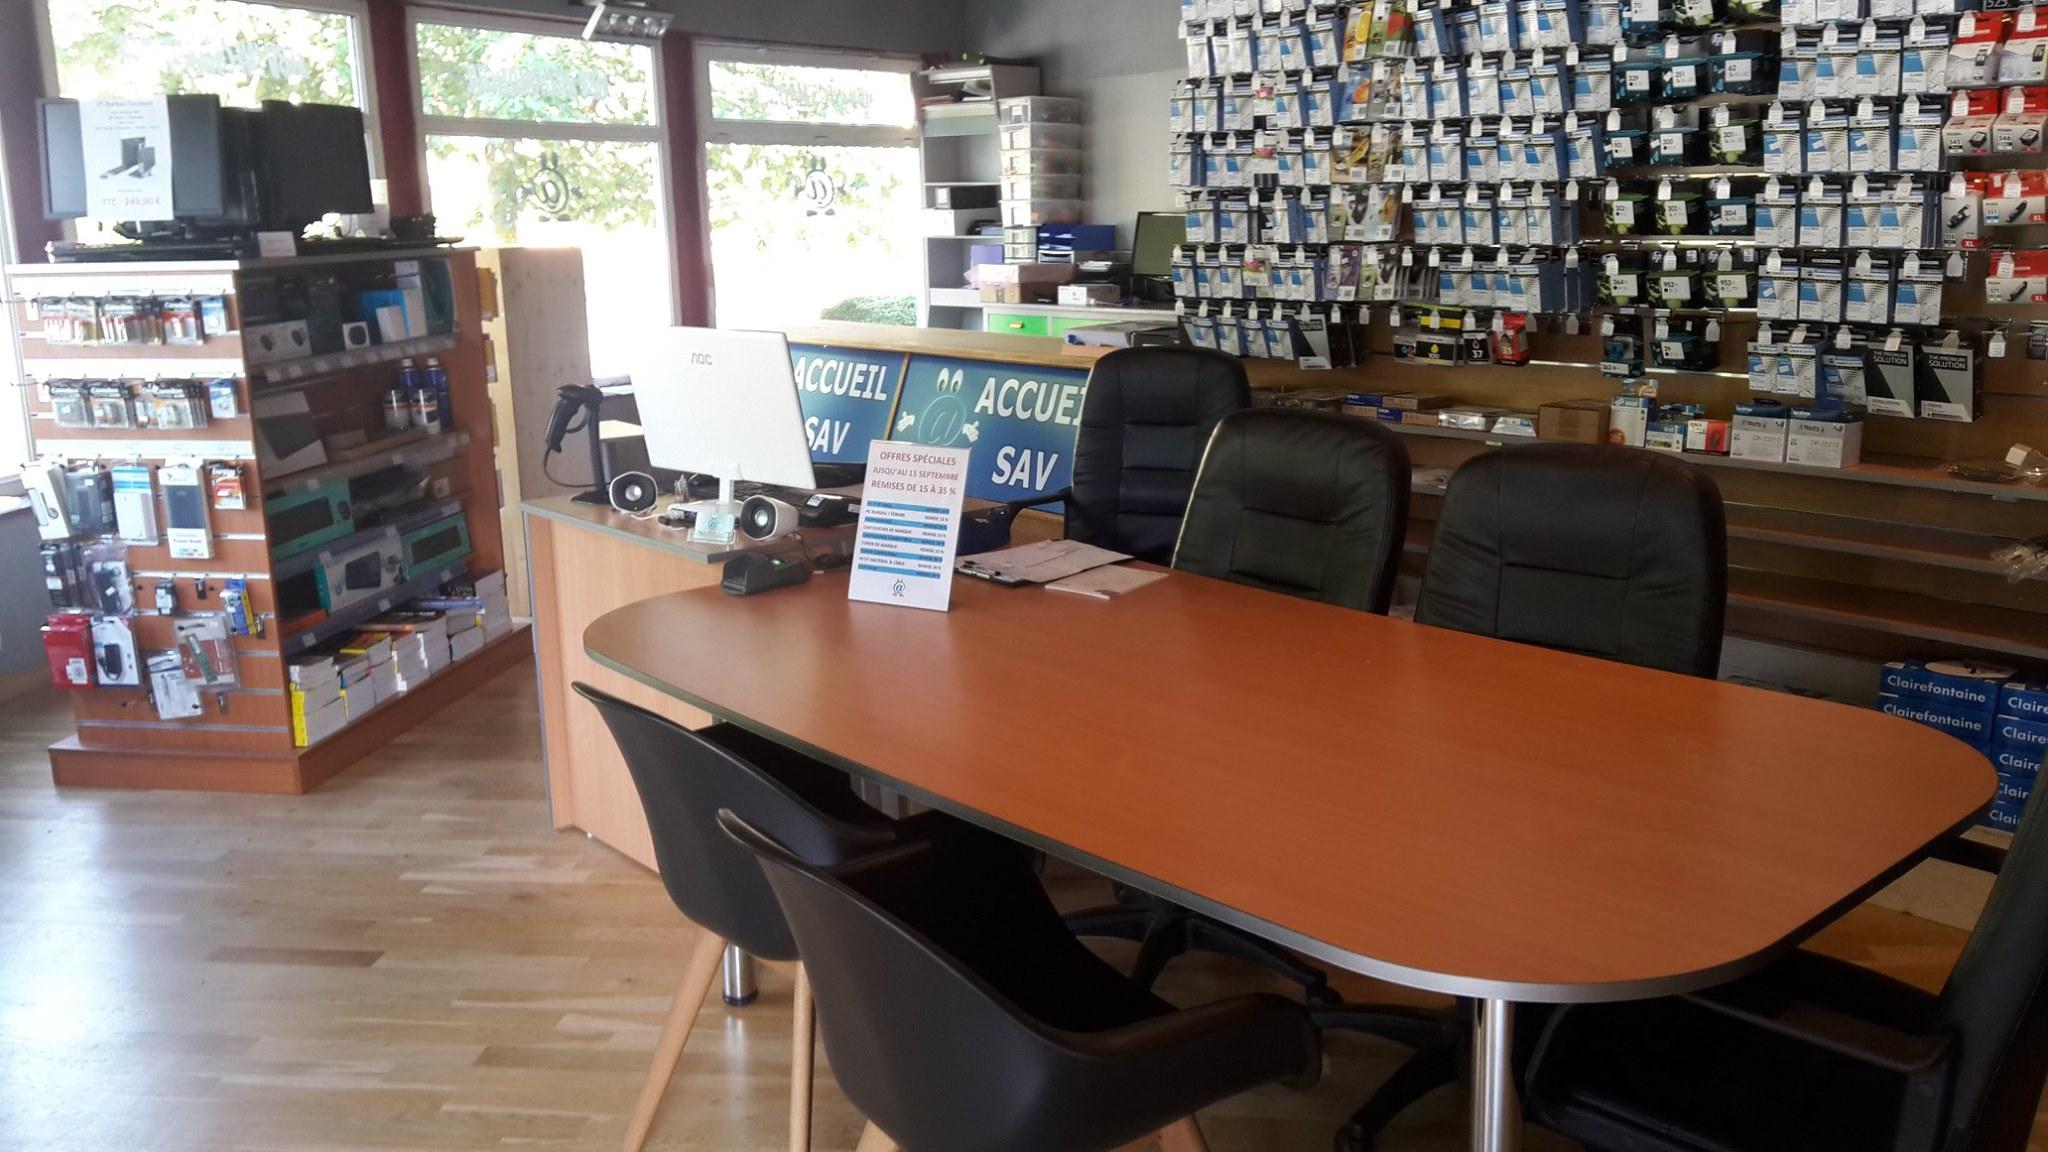 Intérieur du magasin MBV Informatique